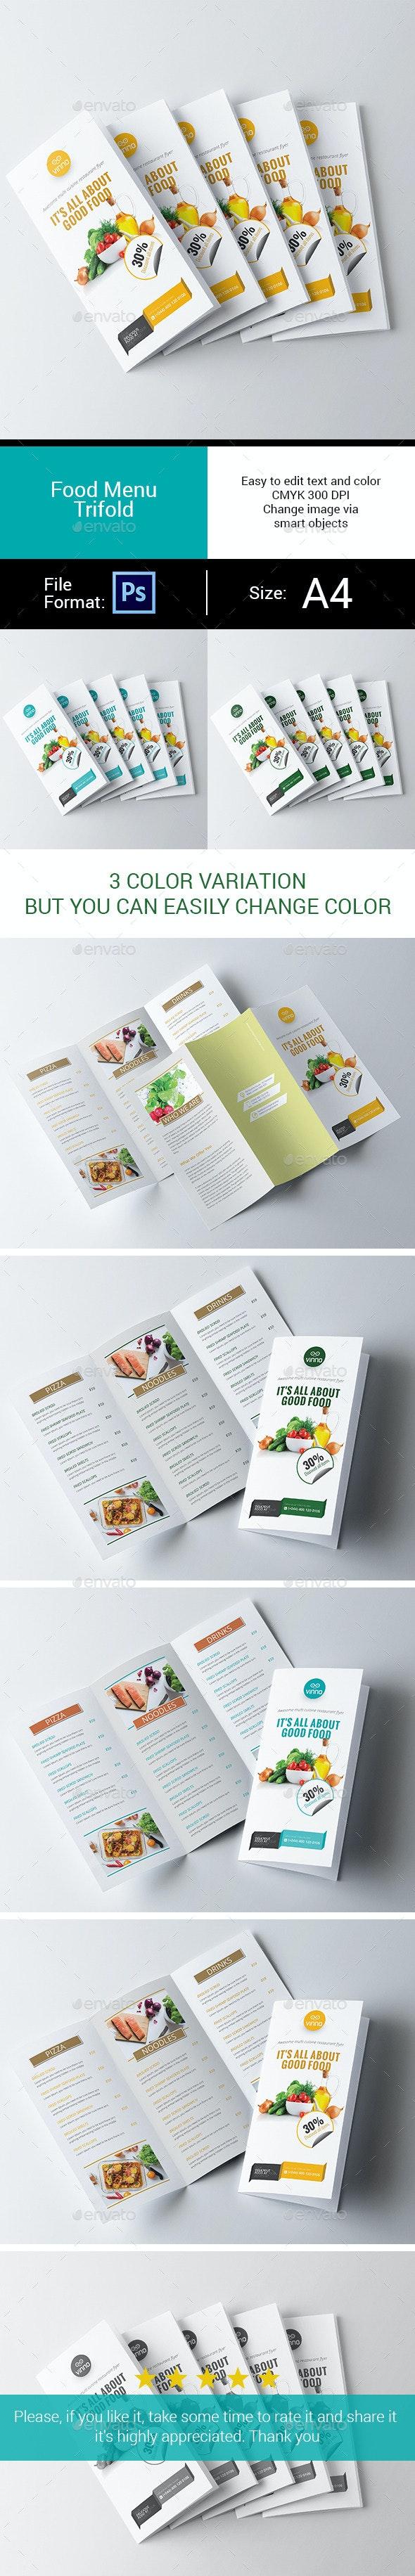 Food Menu Trifold - Food Menus Print Templates